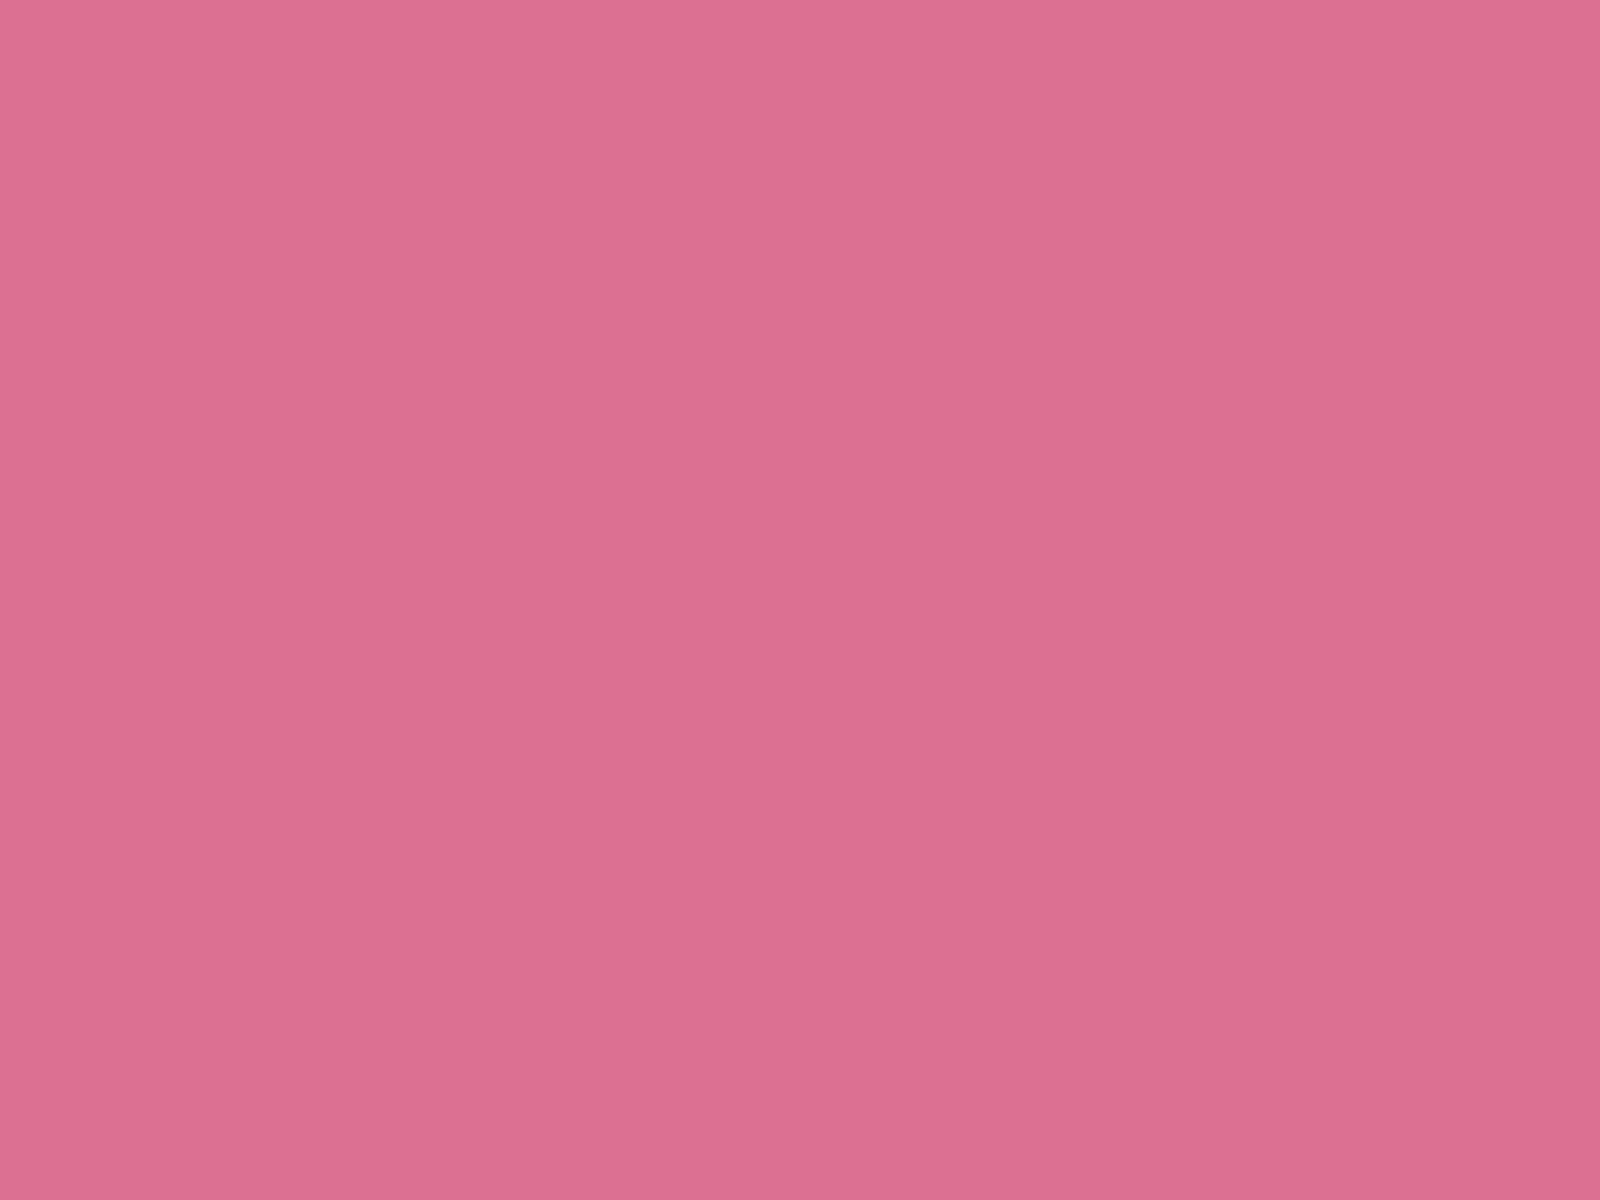 1600x1200 Pale Red-violet Solid Color Background